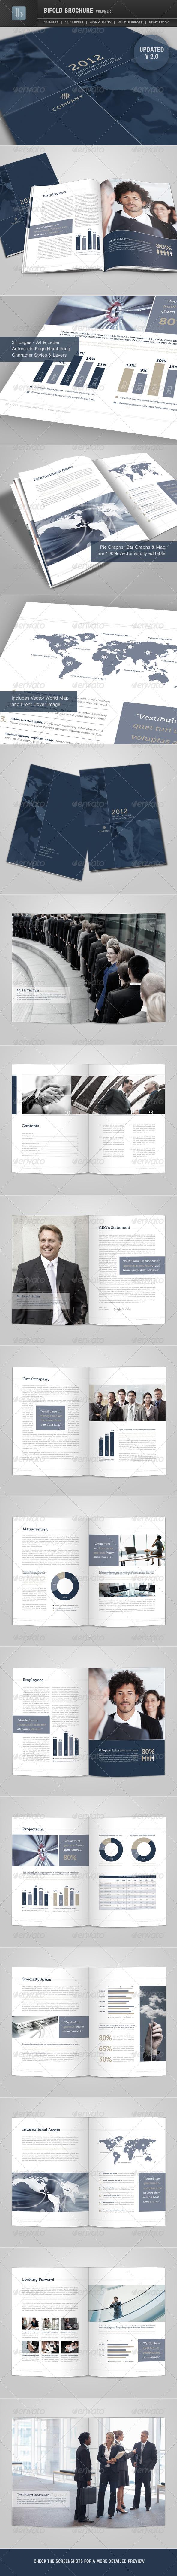 GraphicRiver Bifold Brochure Volume 3 1503497